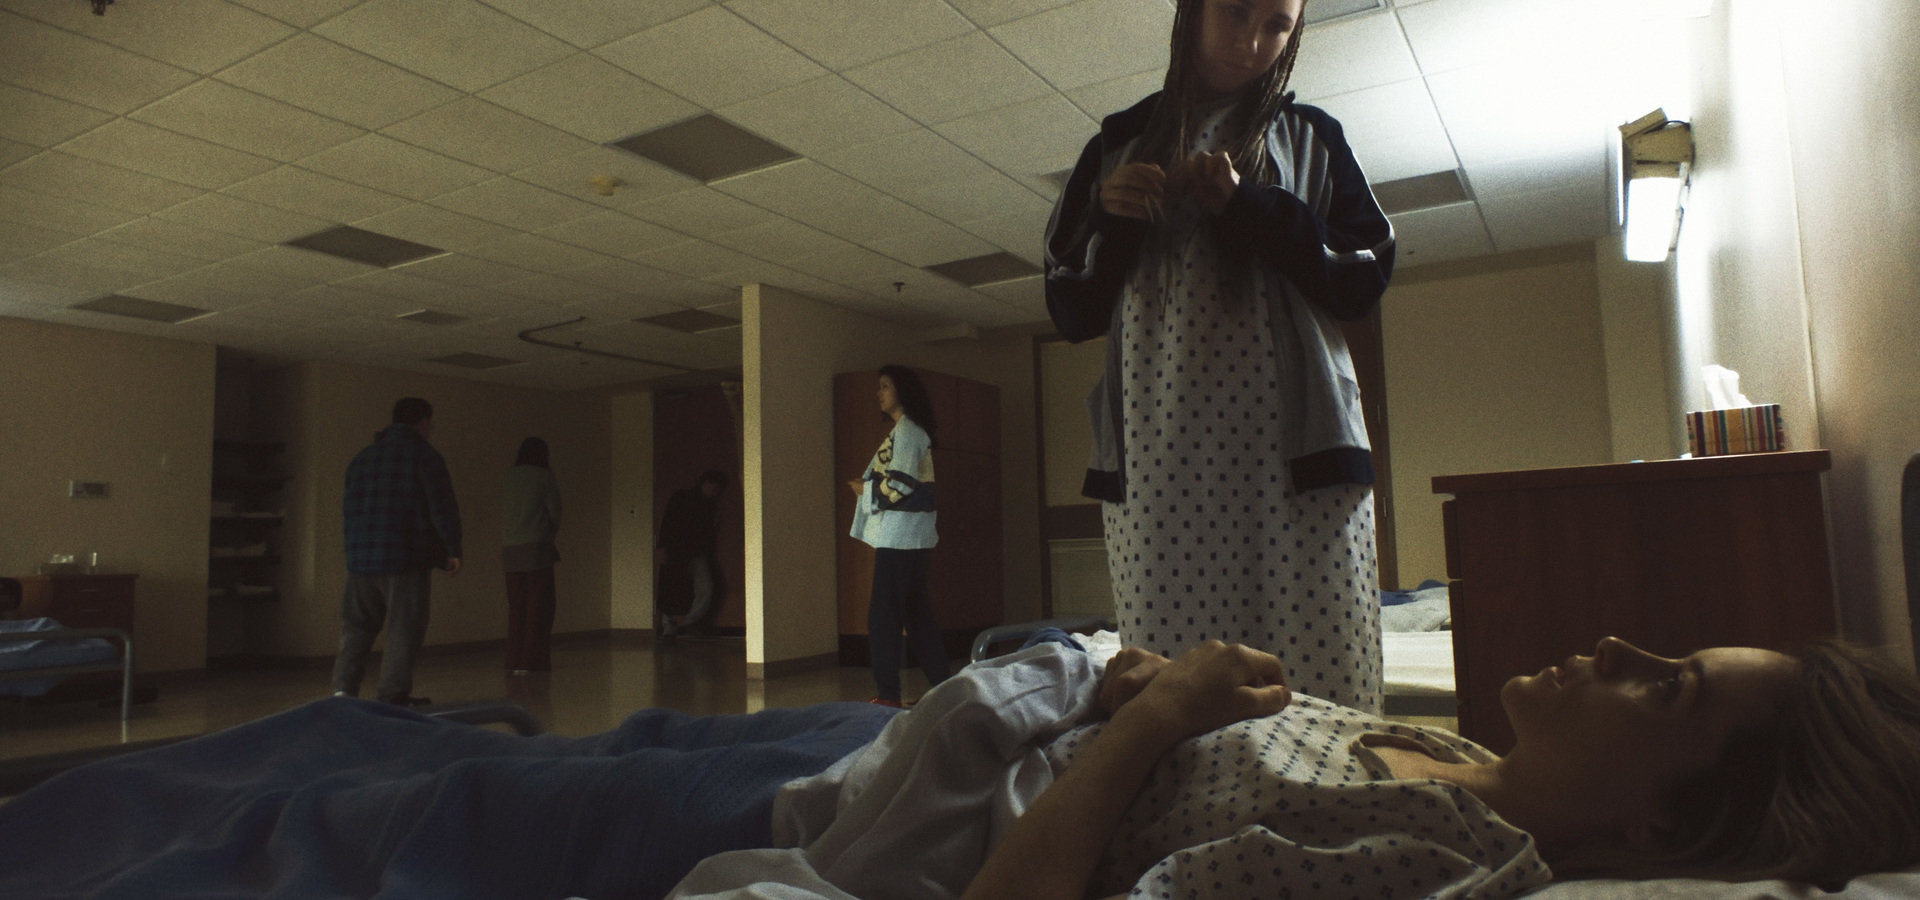 """Niepoczytalna"" - thriller w reżyserii Stevena Soderbergha 27 lipca w kinach"